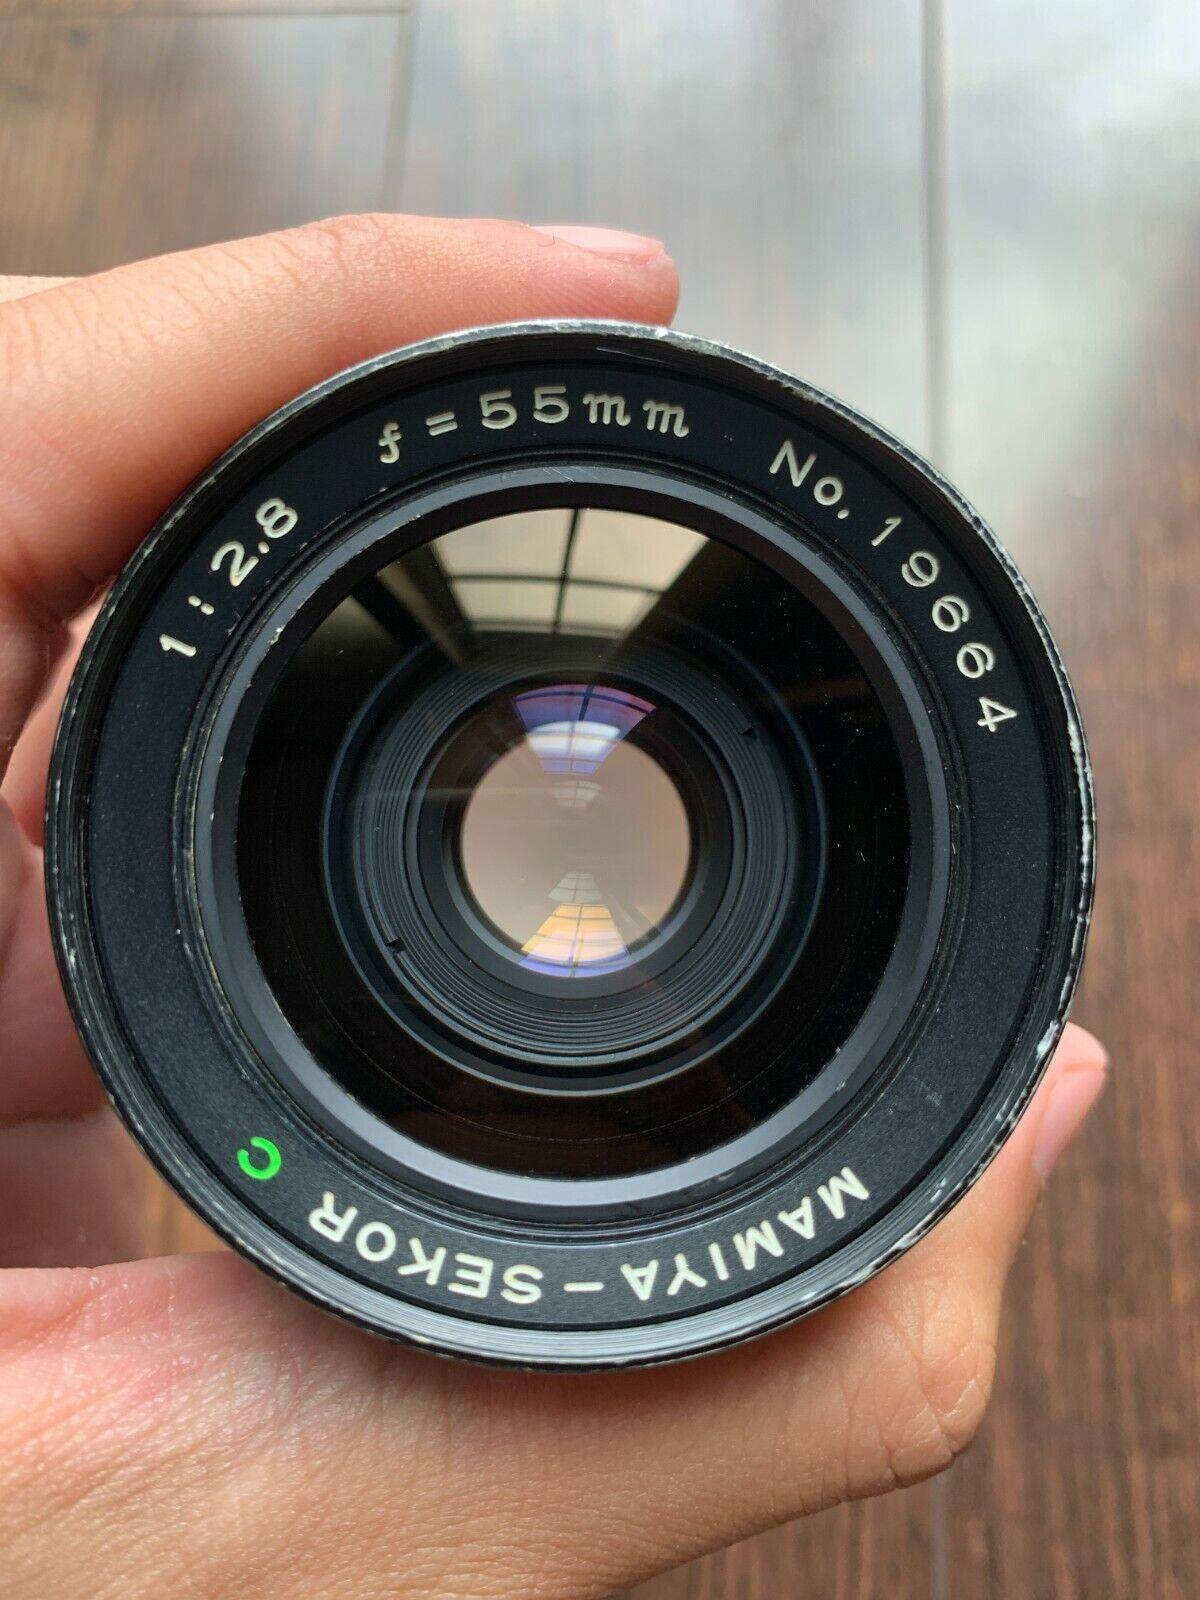 Mamiya Sekor C 55mm F/2.8 Lens For M645 Super 1000S Pro TL - $275.00